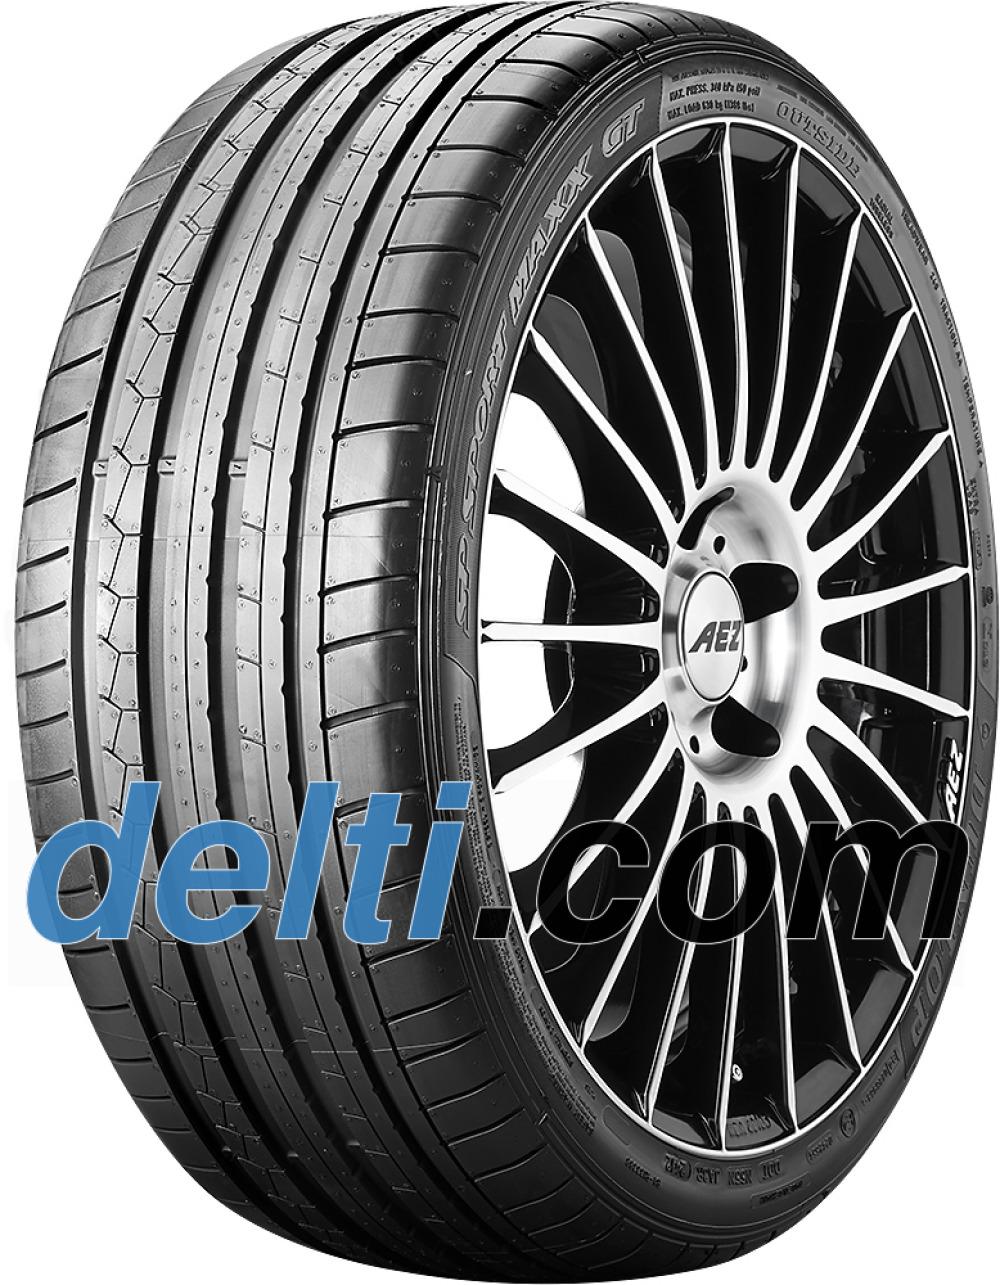 Dunlop SP Sport Maxx GT ( 275/25 ZR20 (91Y) XL med fælgbeskyttelse (MFS) )